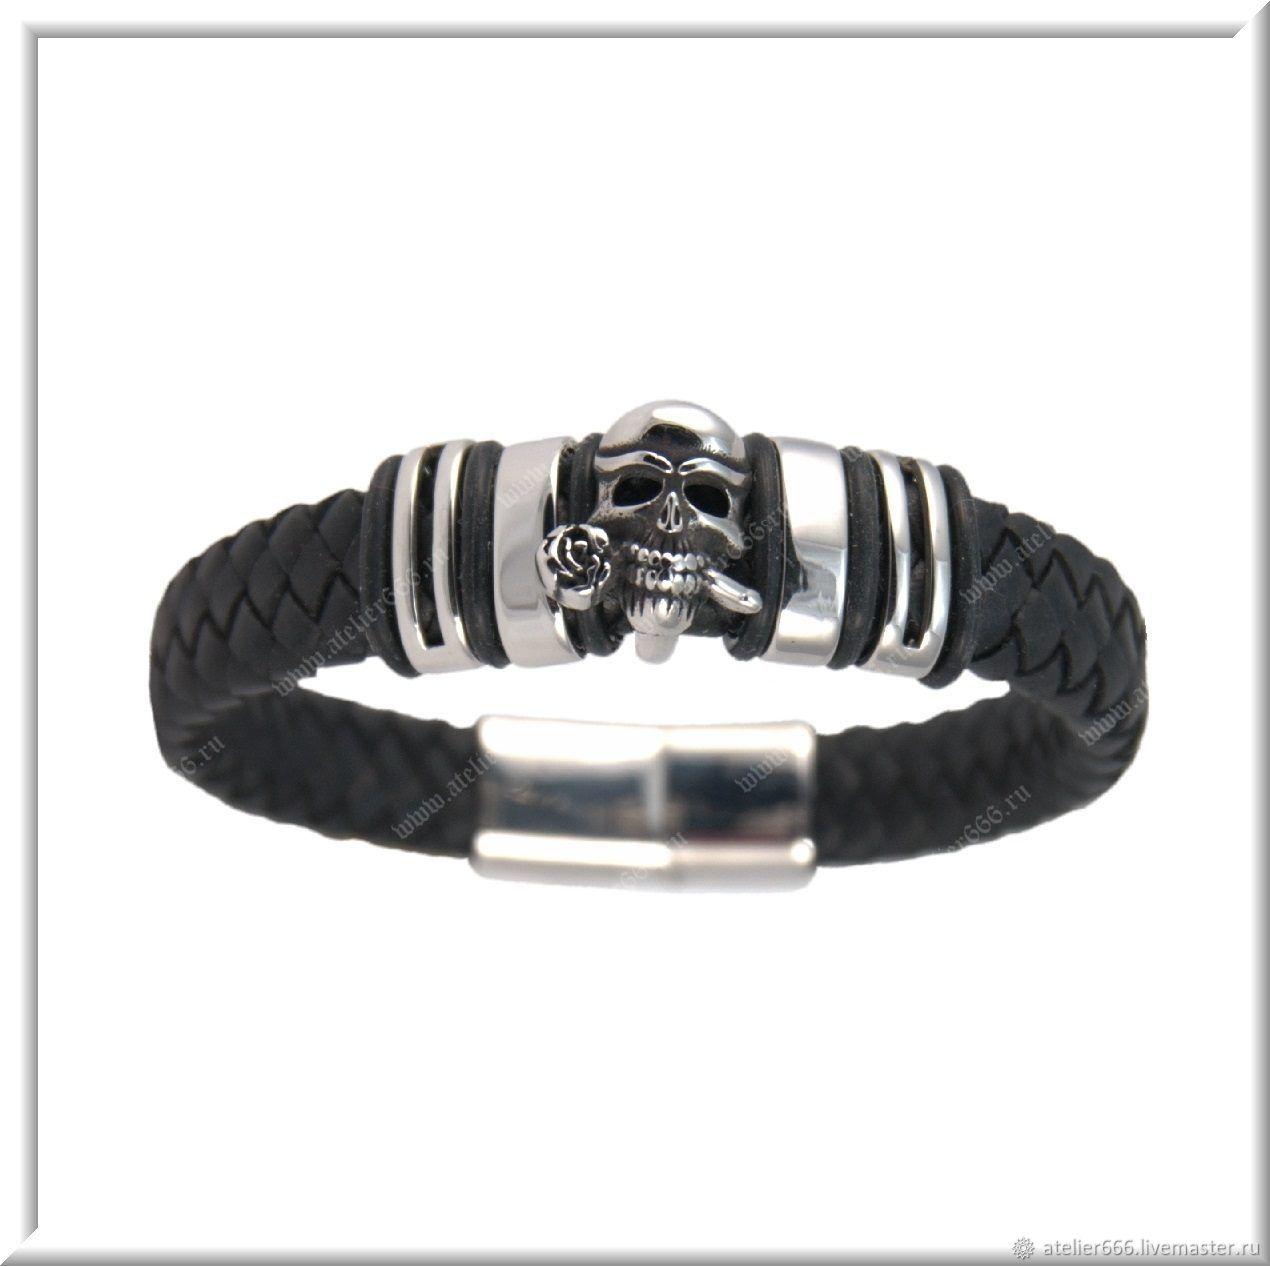 Women's leather bracelet No. 5 accessories steel 316L, Regaliz bracelet, Moscow,  Фото №1